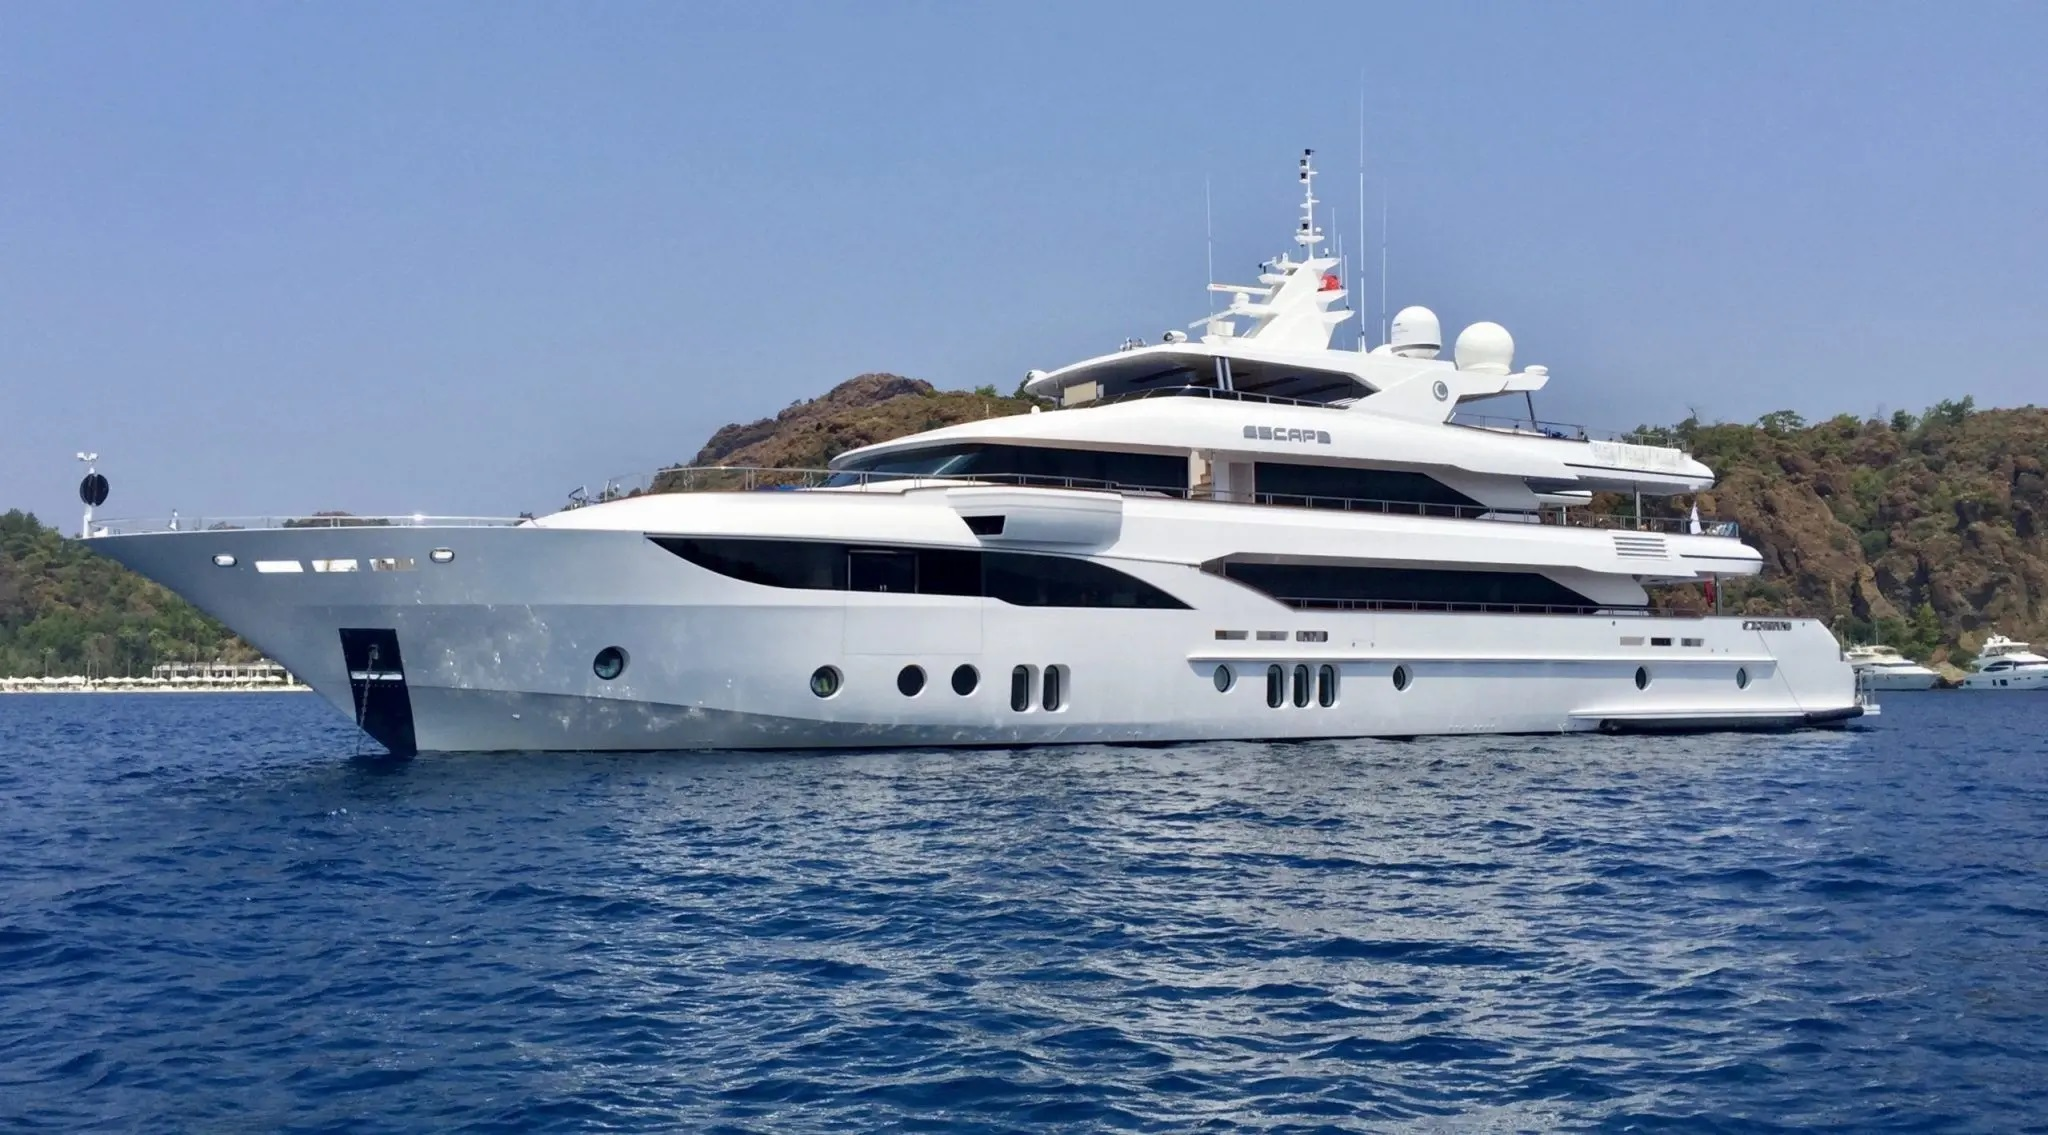 Motor yacht Escape